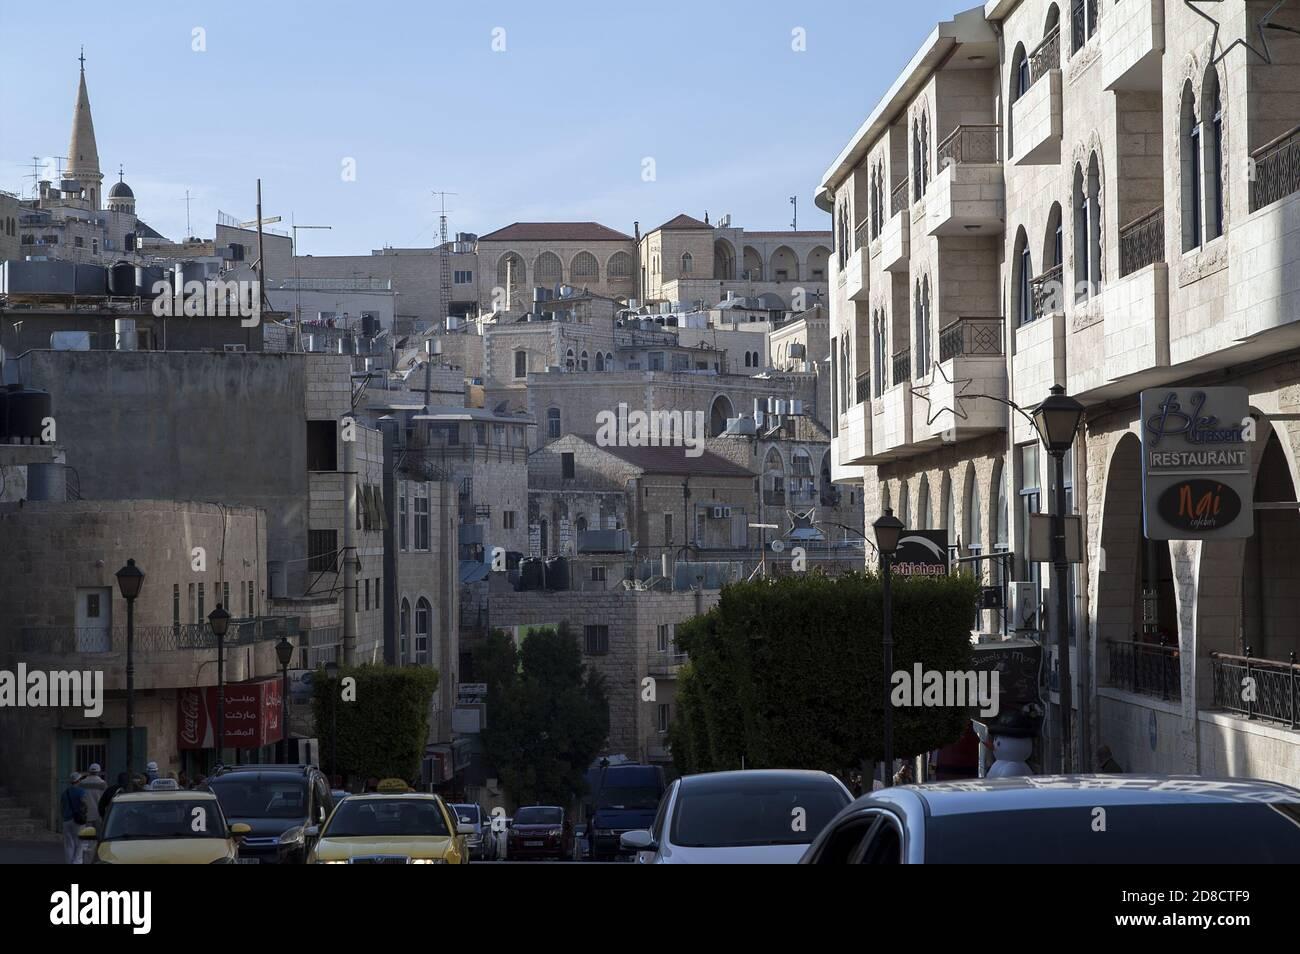 Bethlehem, בית לחם, Palestine, بيت لحم, Israel, Izrael, ישראל, Palestyna, دولة فلسطين; One of the typical streets in the city. Eine der Straßen. Stock Photo